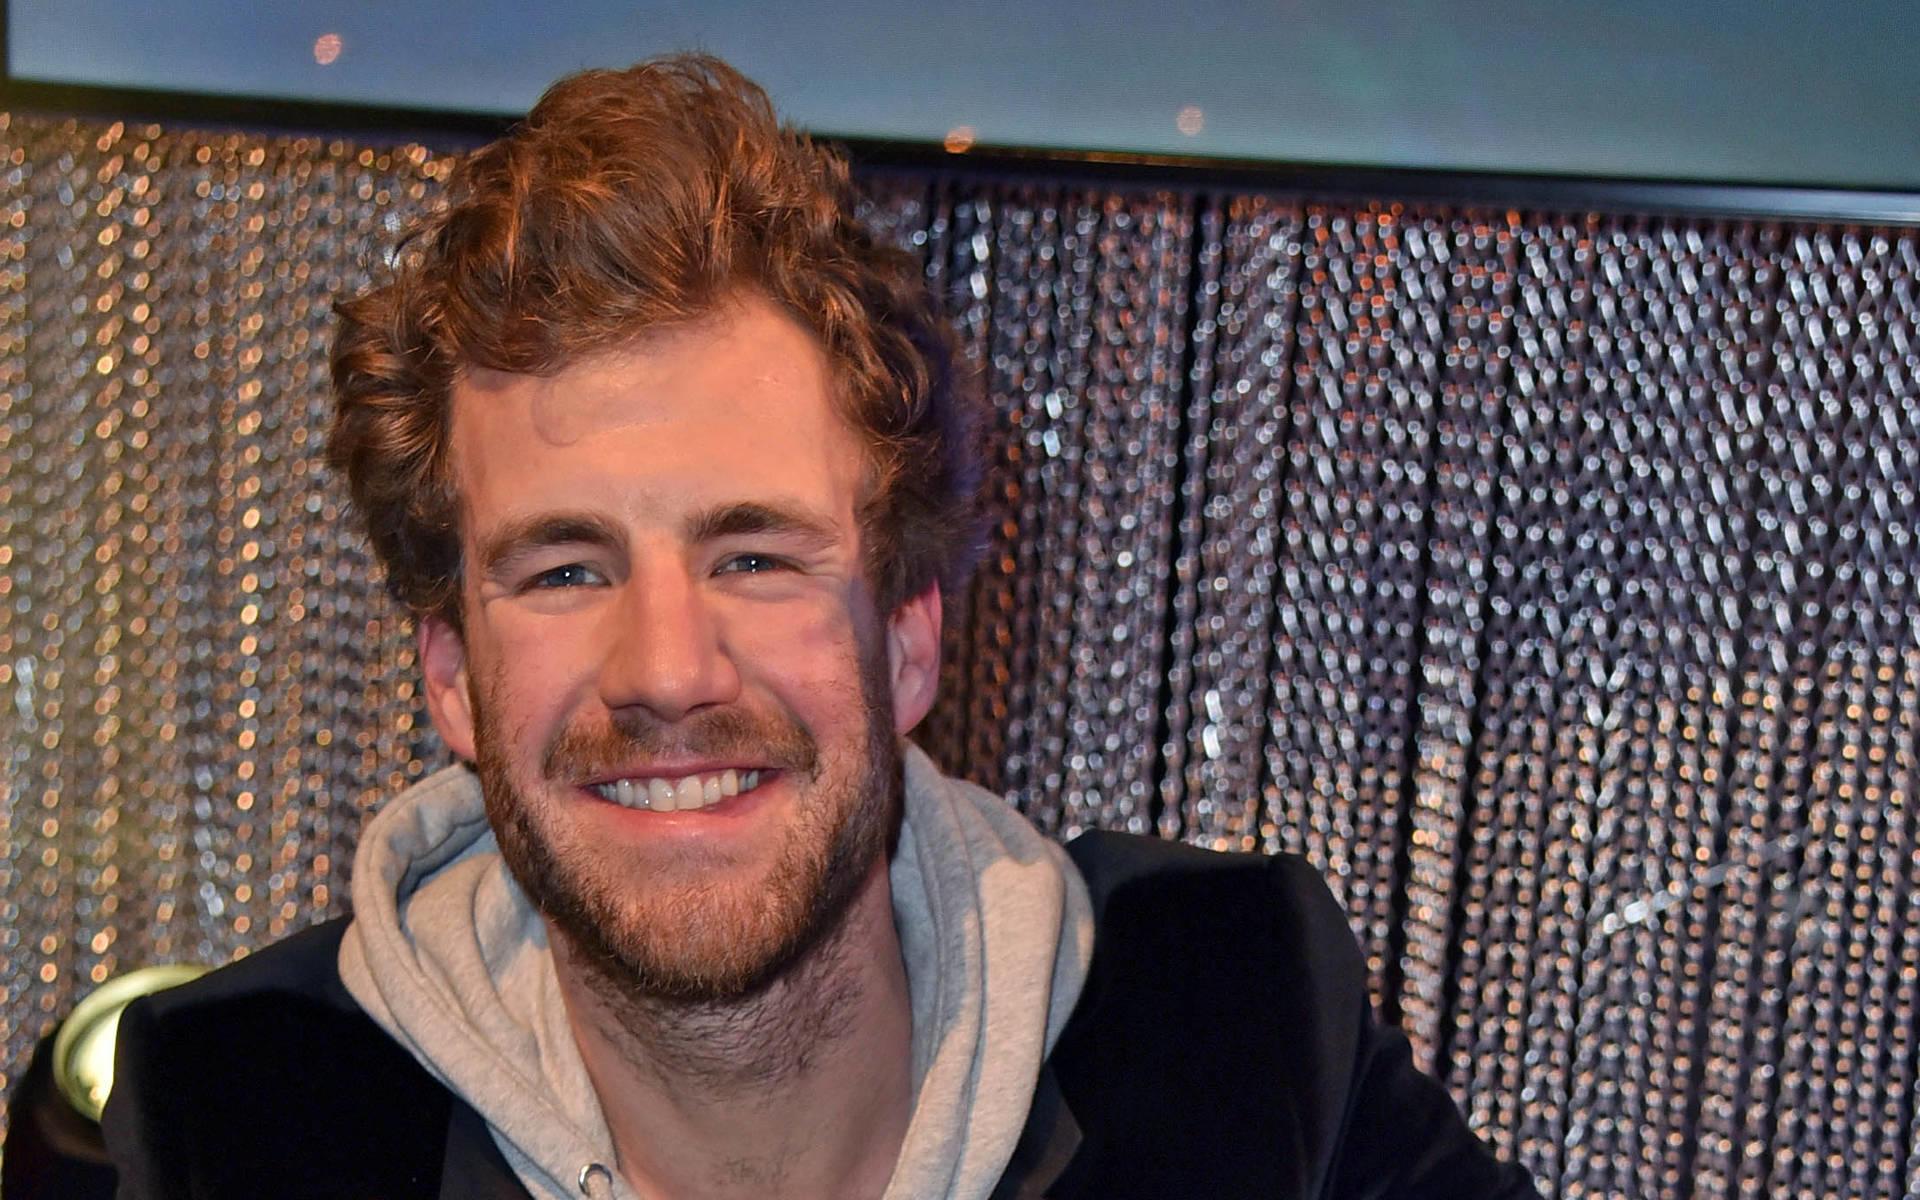 Luke Mockridge Wegen Kuriosem Auftritt Im ZDF